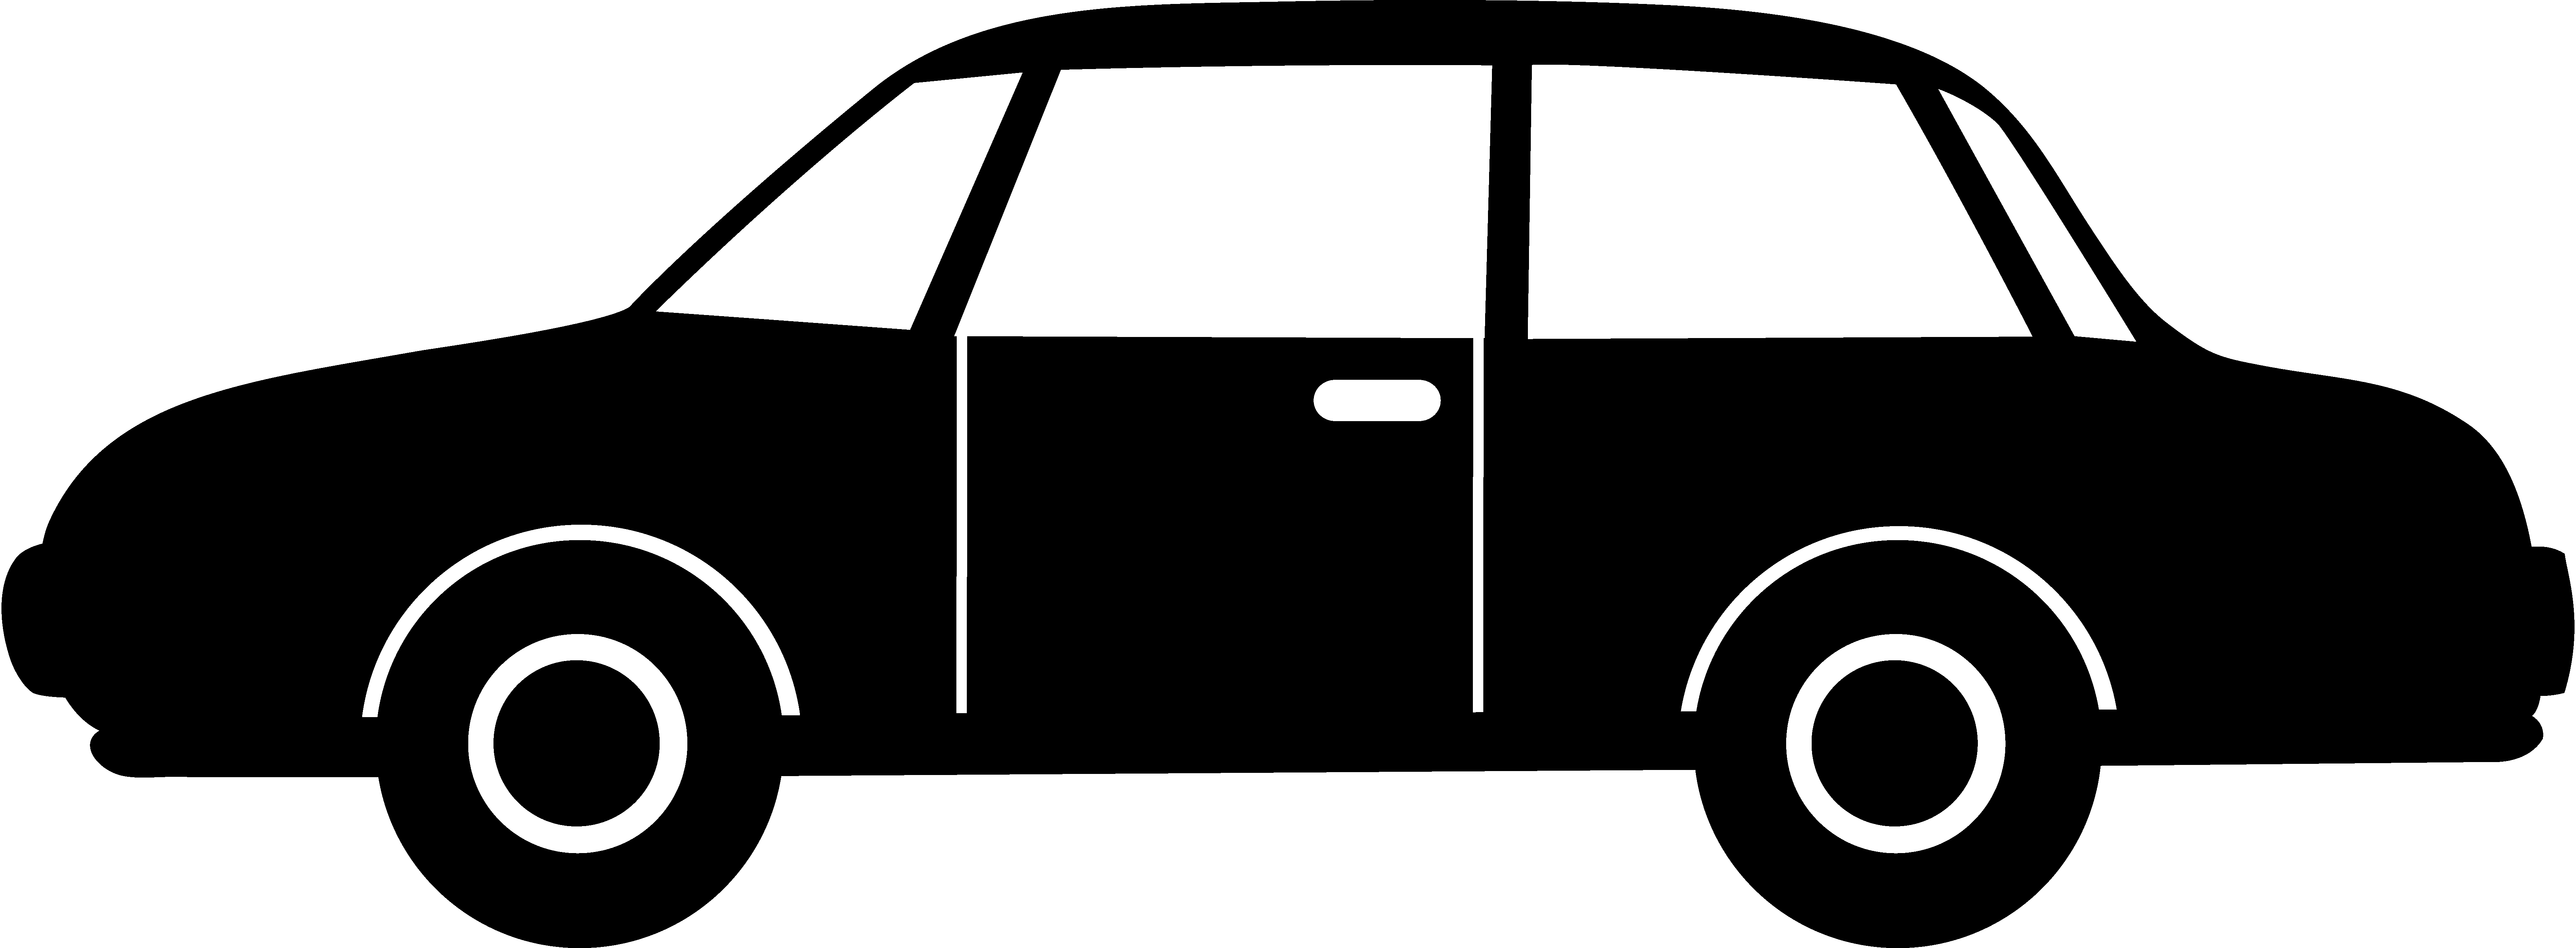 Car Clipart Black And White Clipart Free-Car Clipart Black And White Clipart Free Clipart Images-5